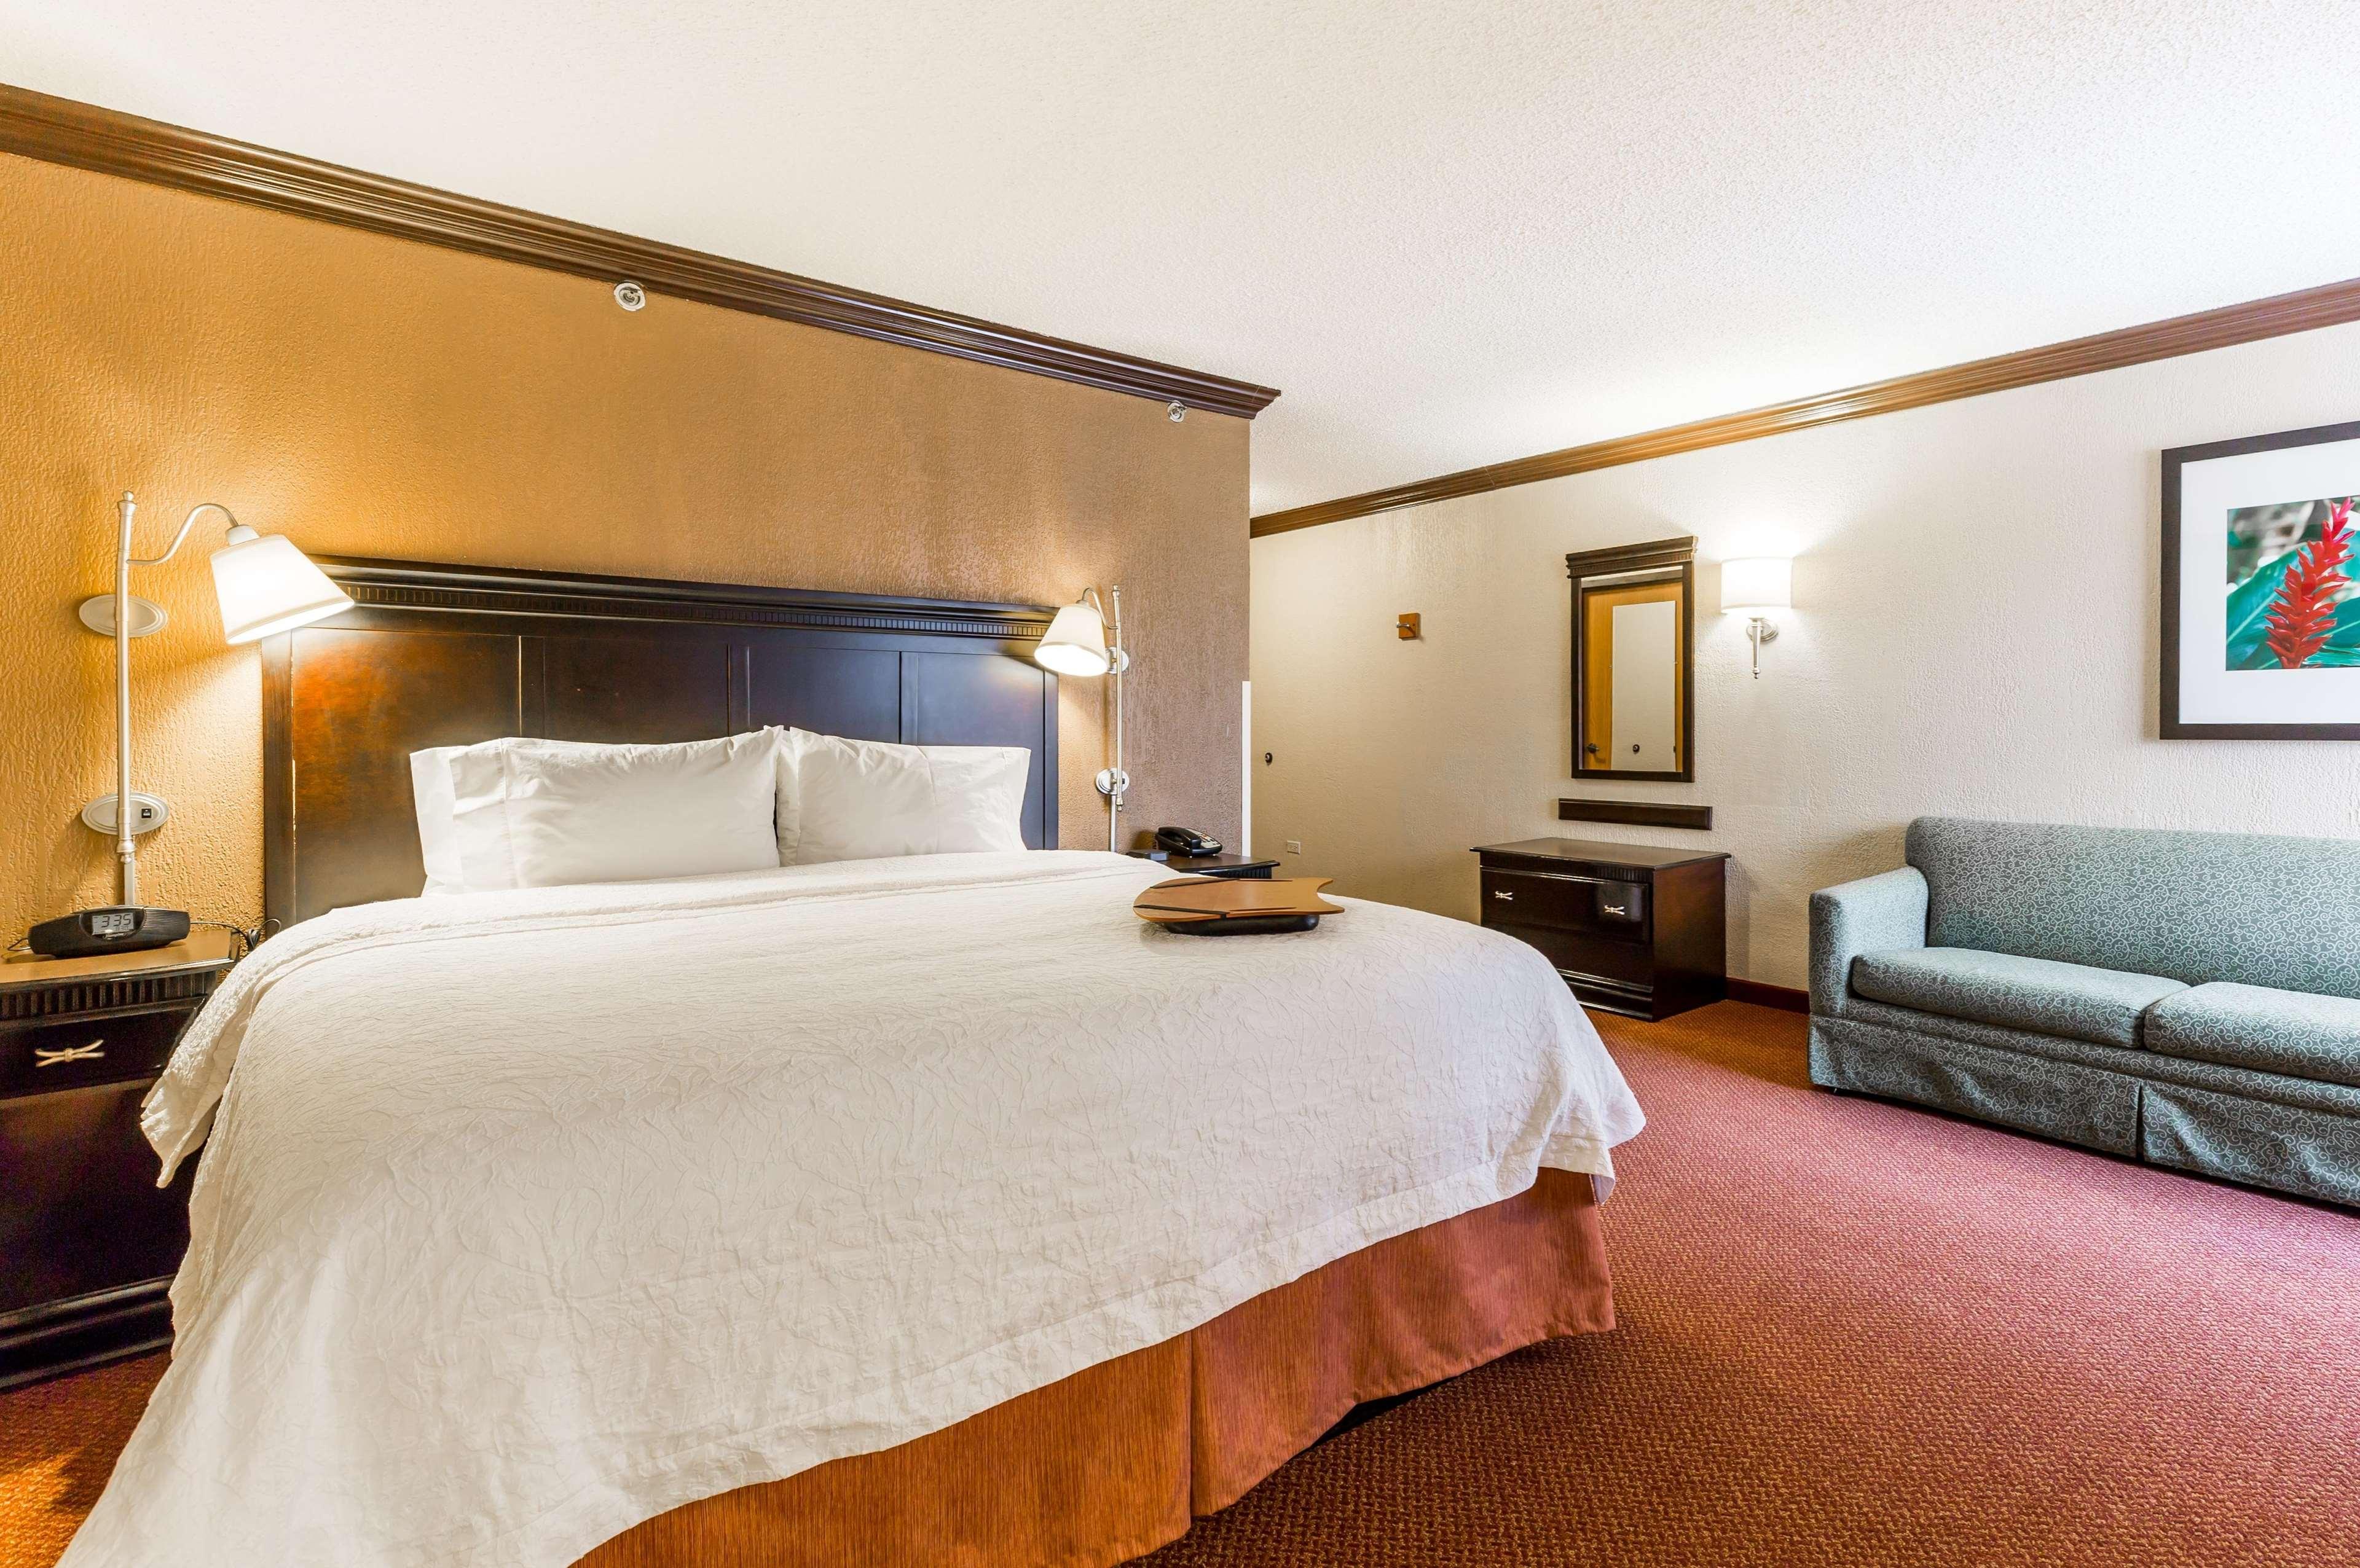 Hampton Inn & Suites Chicago/Hoffman Estates image 38